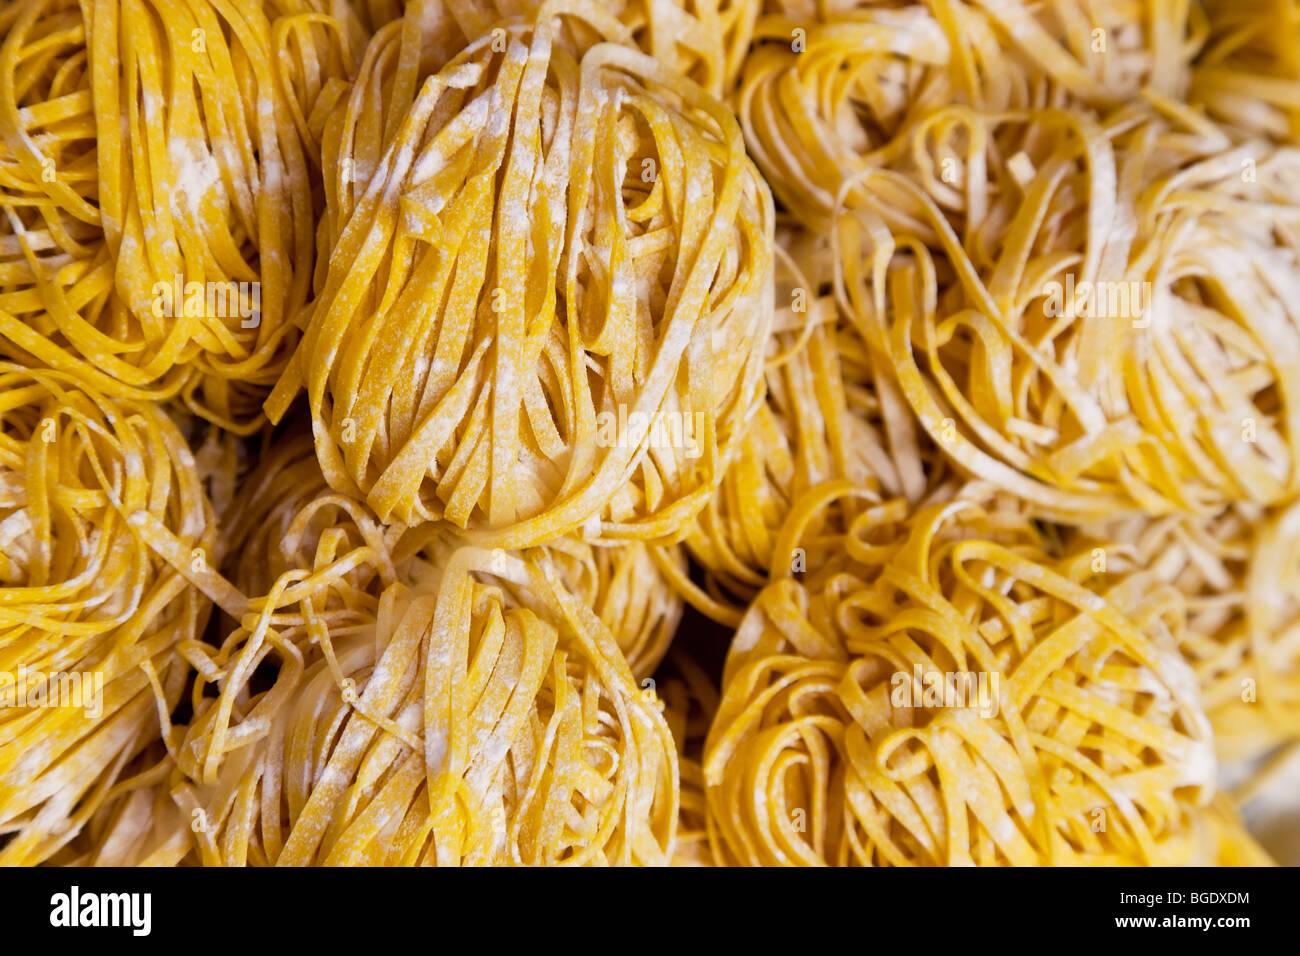 Linguine pasta, Bologna, Emilia Romagna, Italy Stock Photo